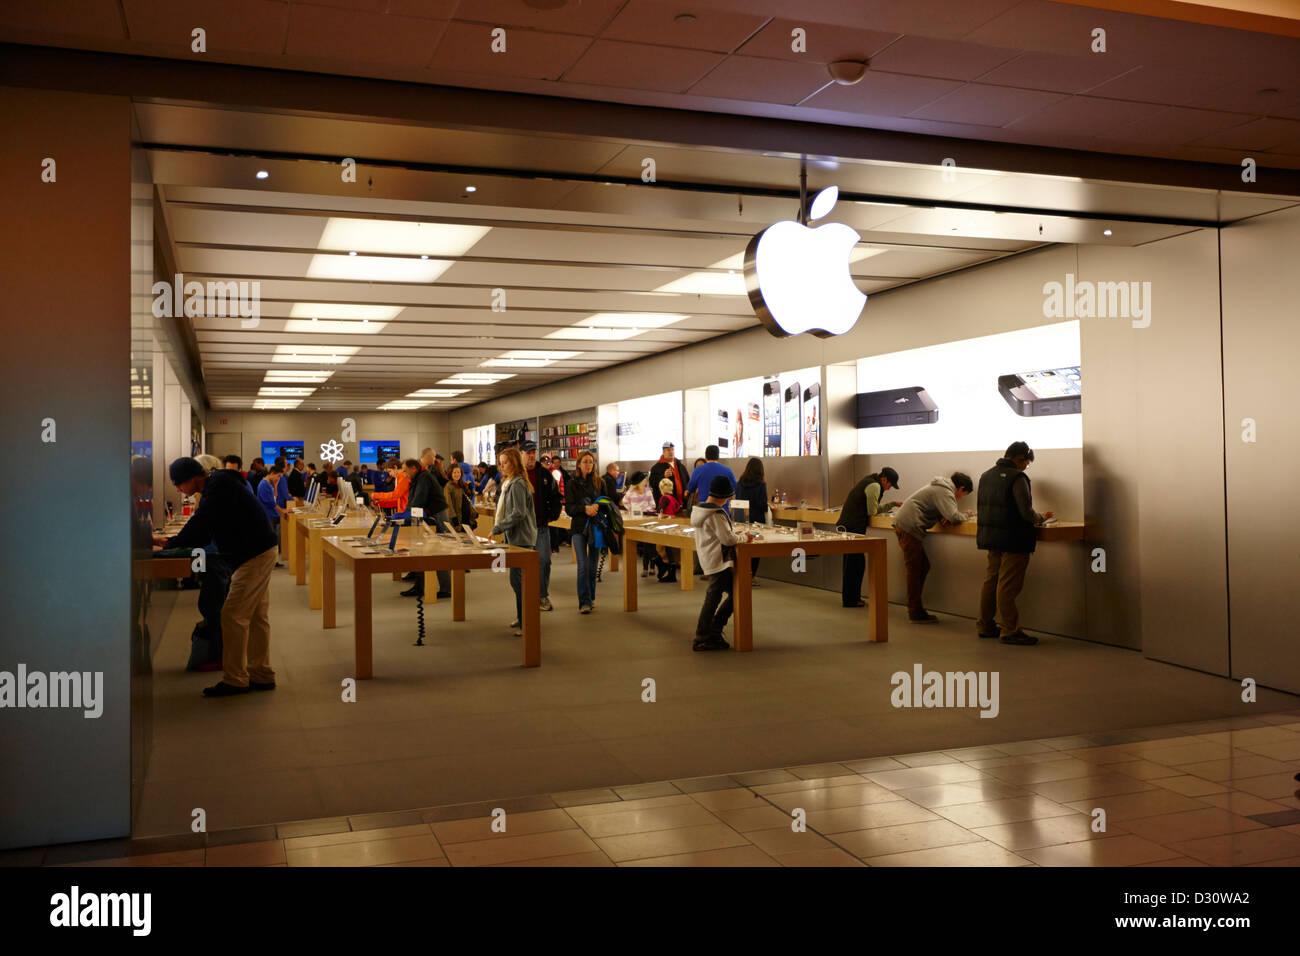 British Apple Store Stock Photos & British Apple Store Stock Images ...